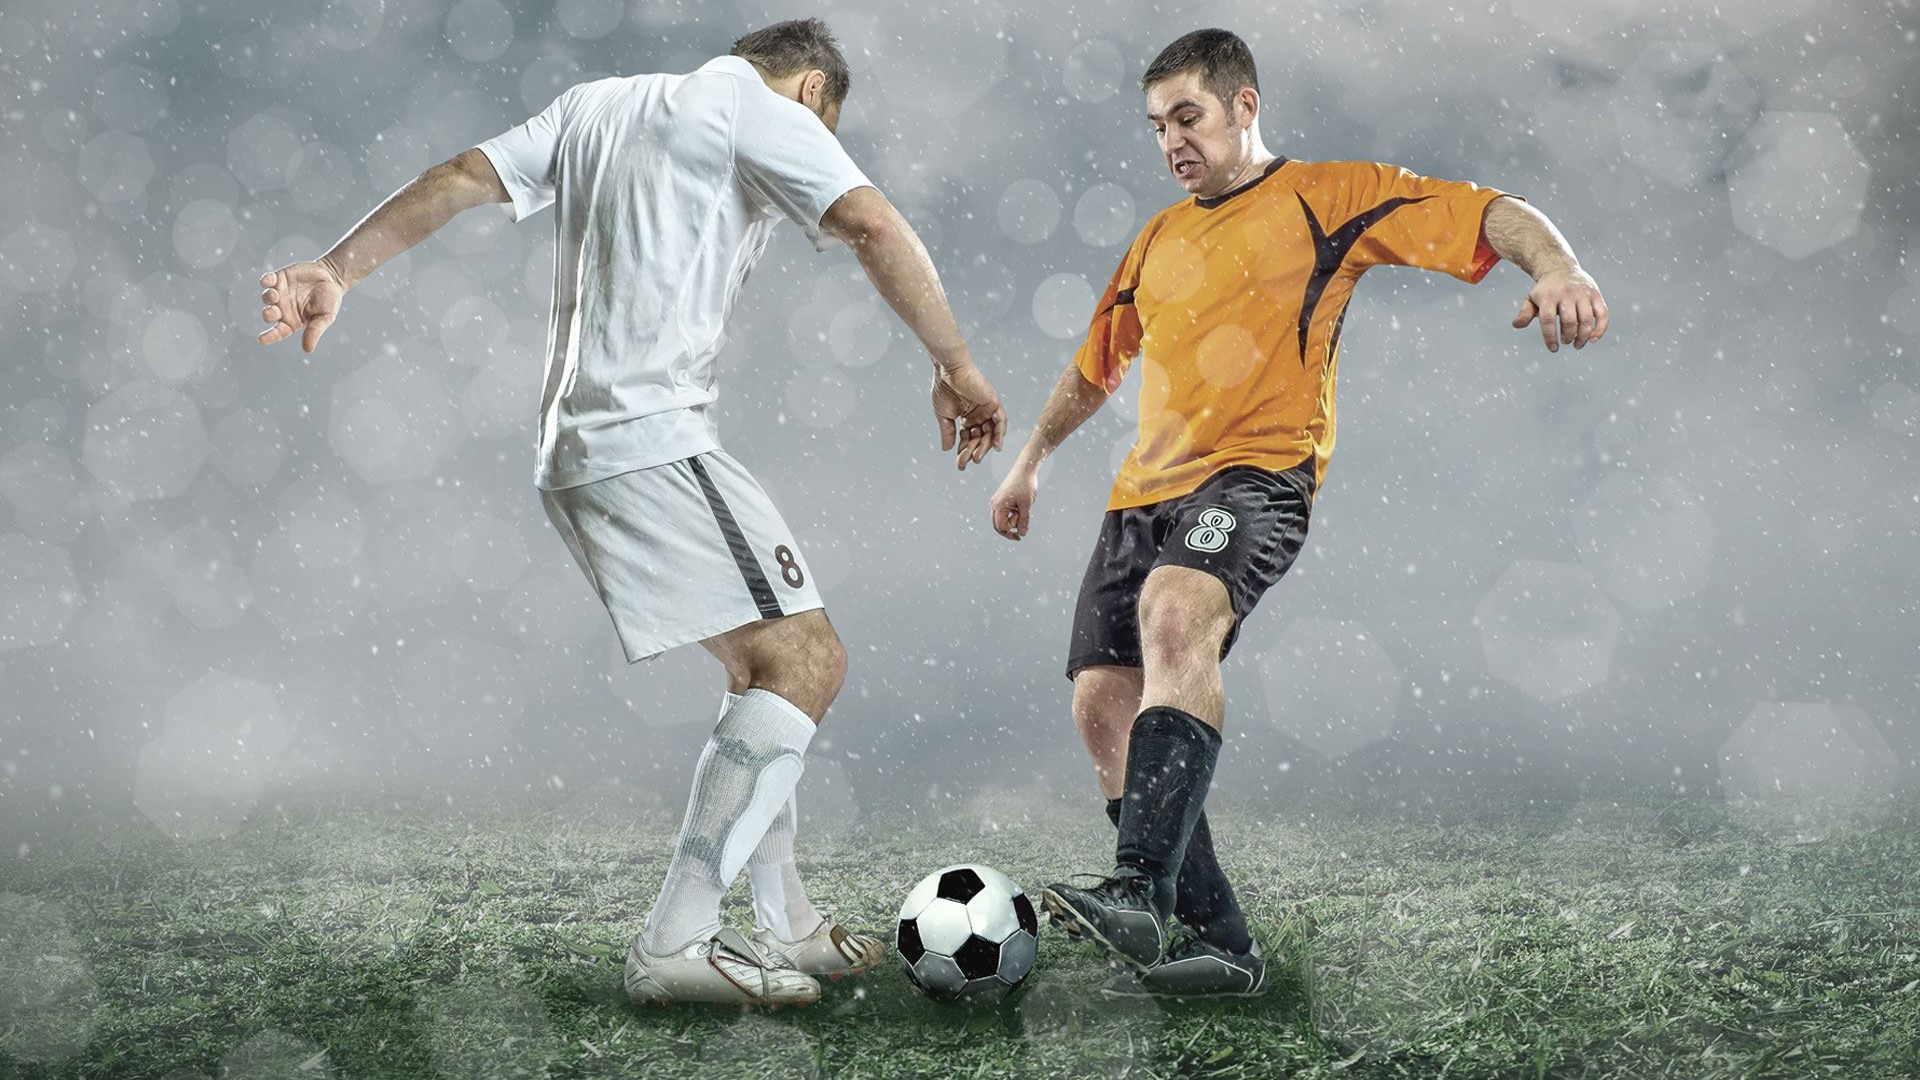 sale-shark-vs-bristol-rugby-stream-live